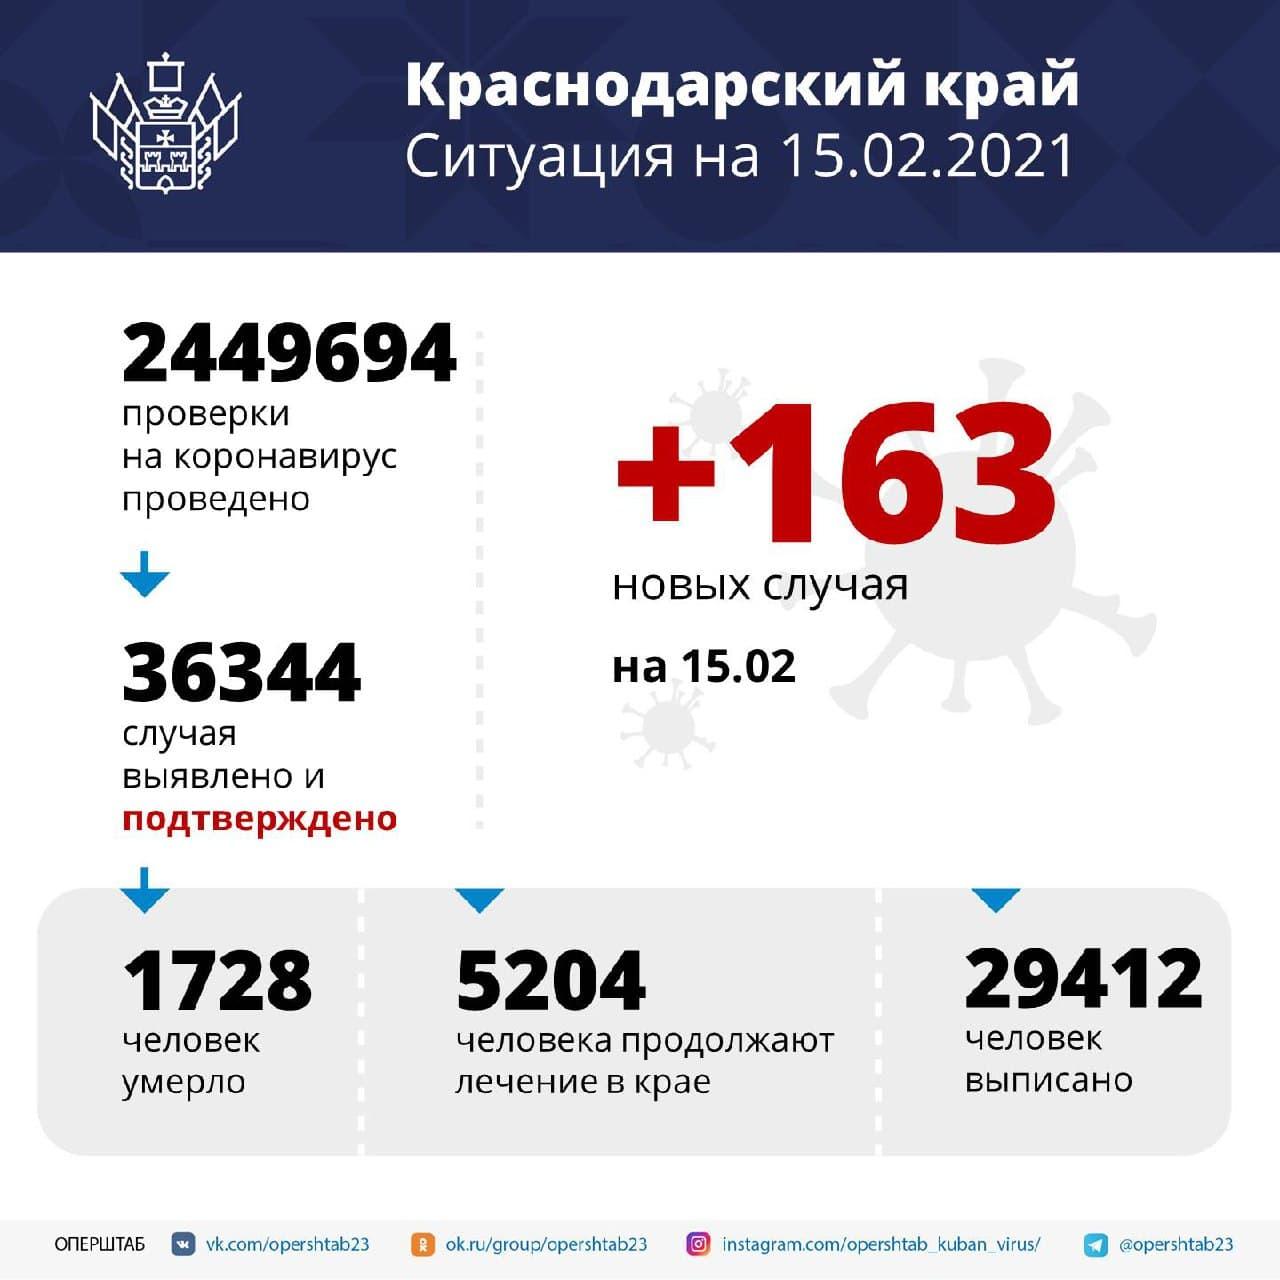 COVID-19 Photo,COVID-19 Twitter Trend : Most Popular Tweets